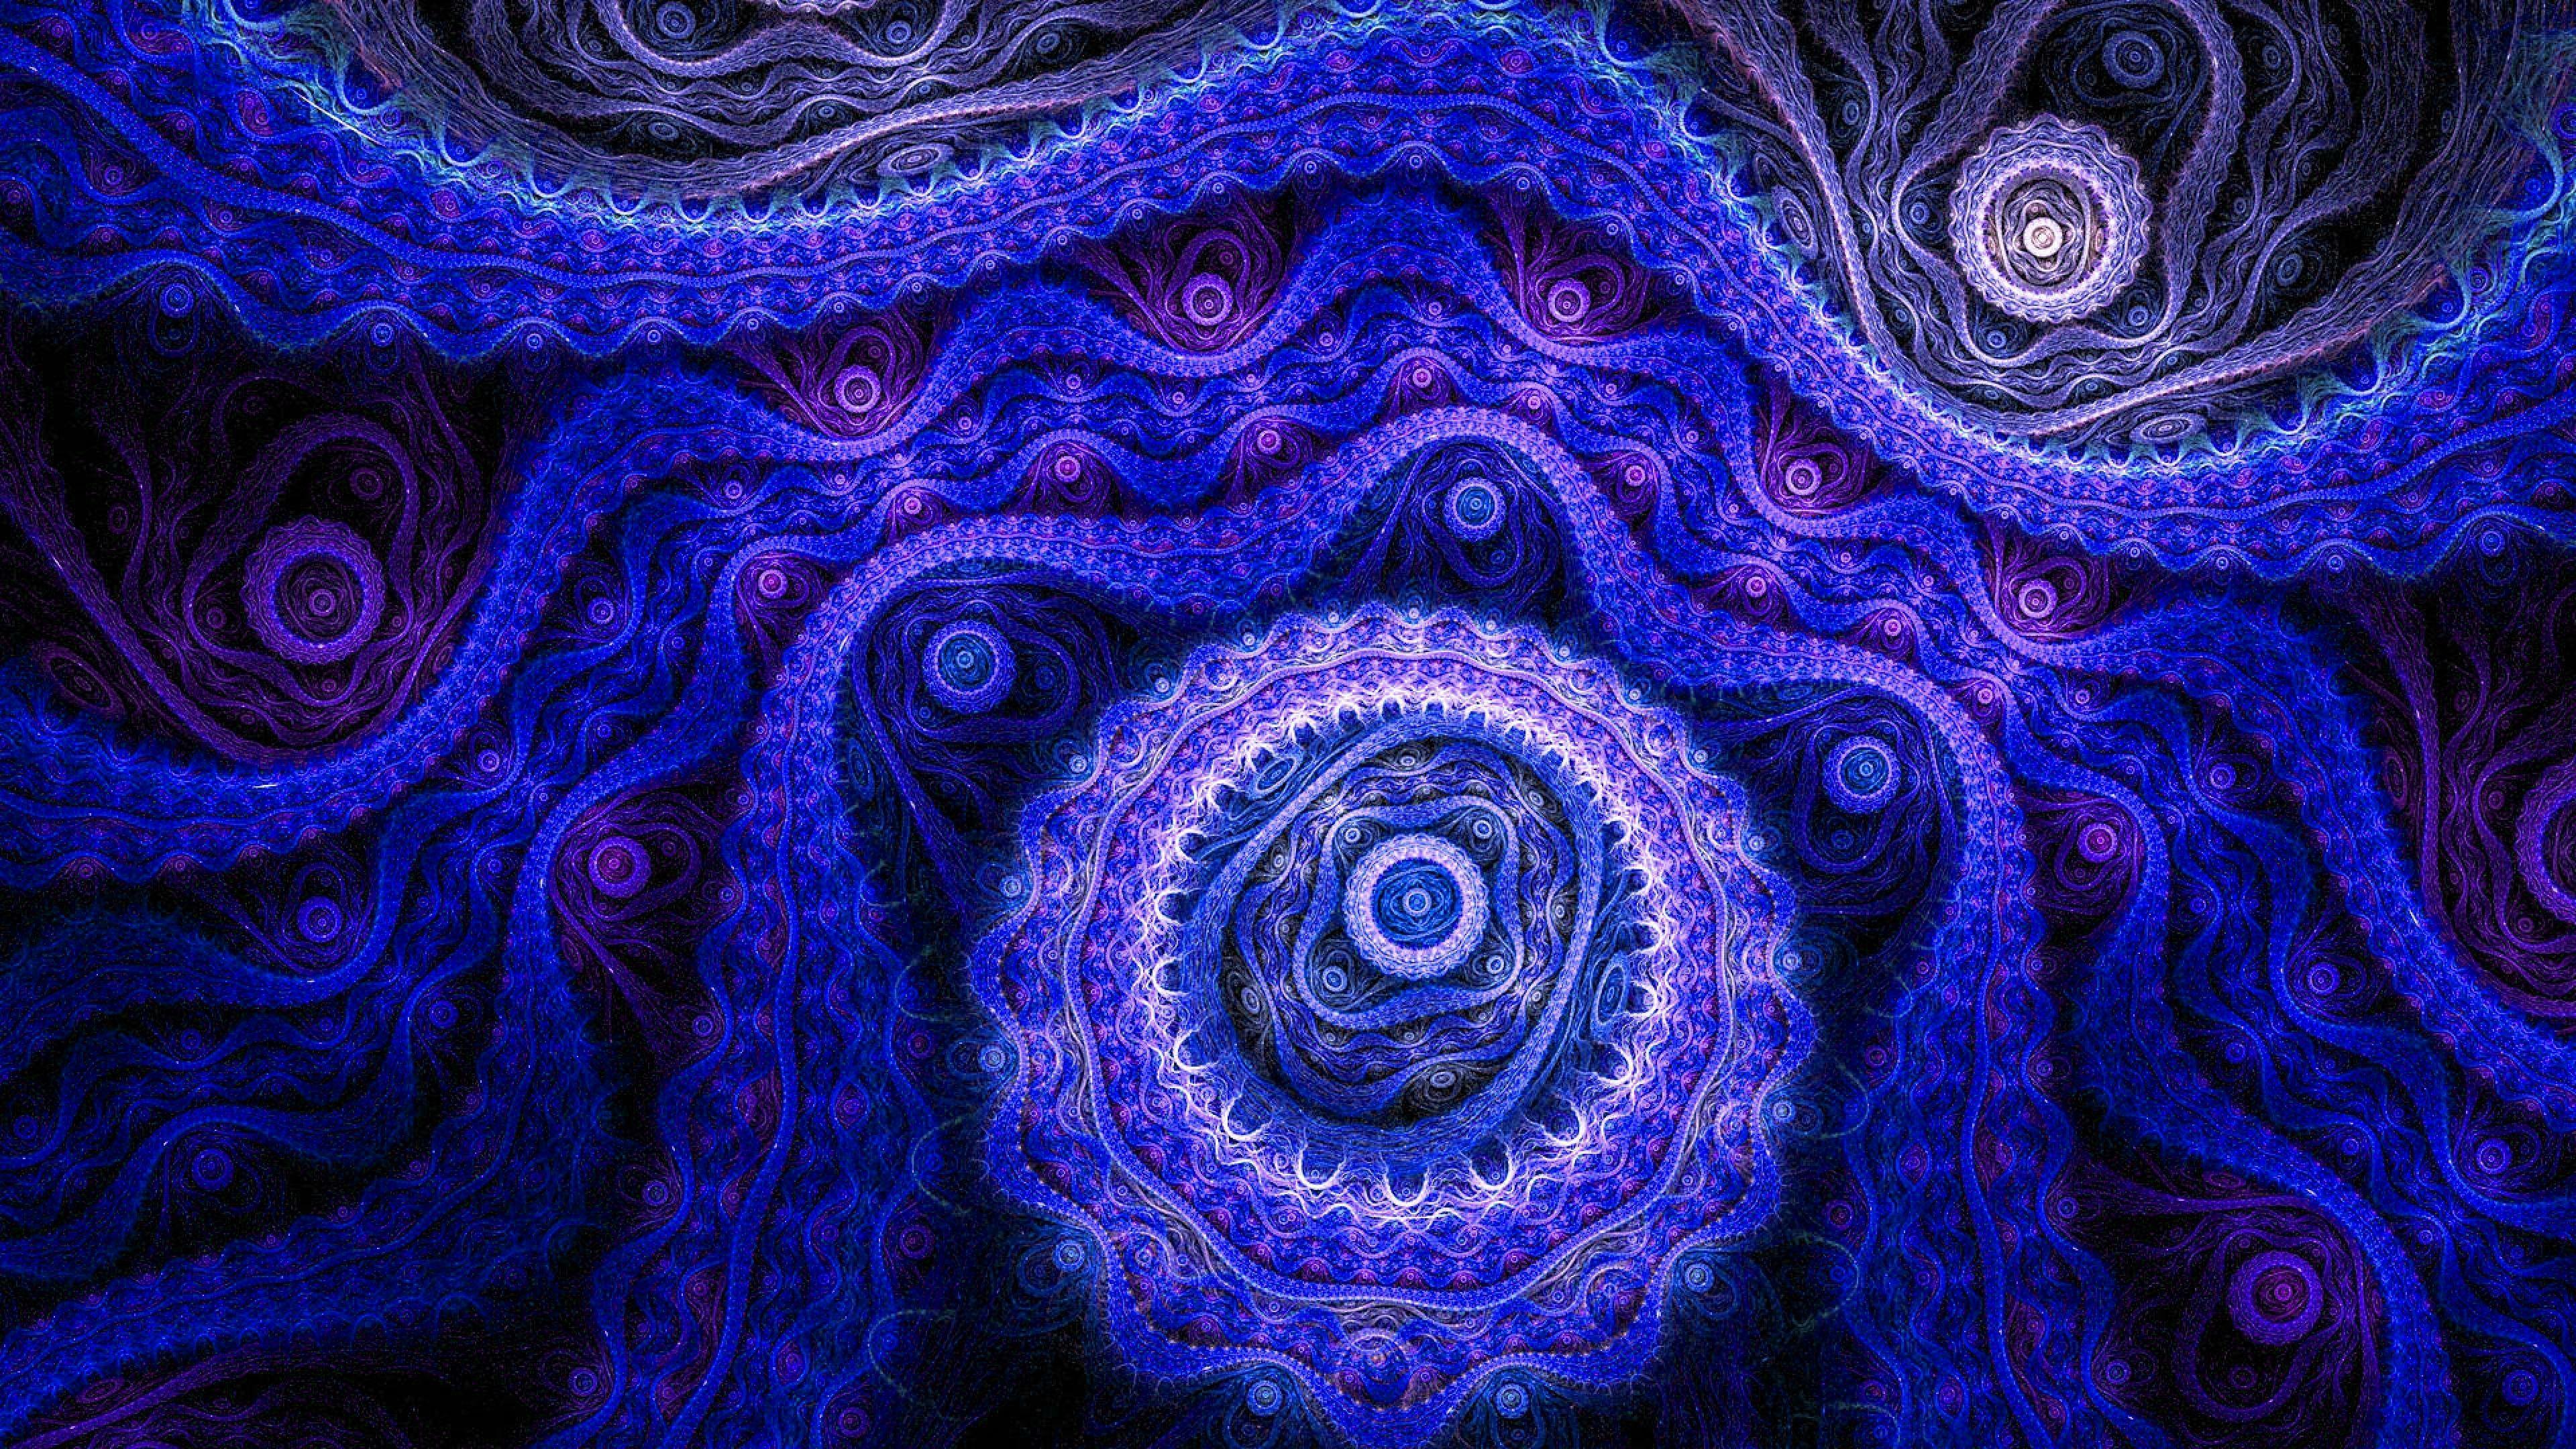 Purple 4k Wallpaper Posted By Christopher Peltier